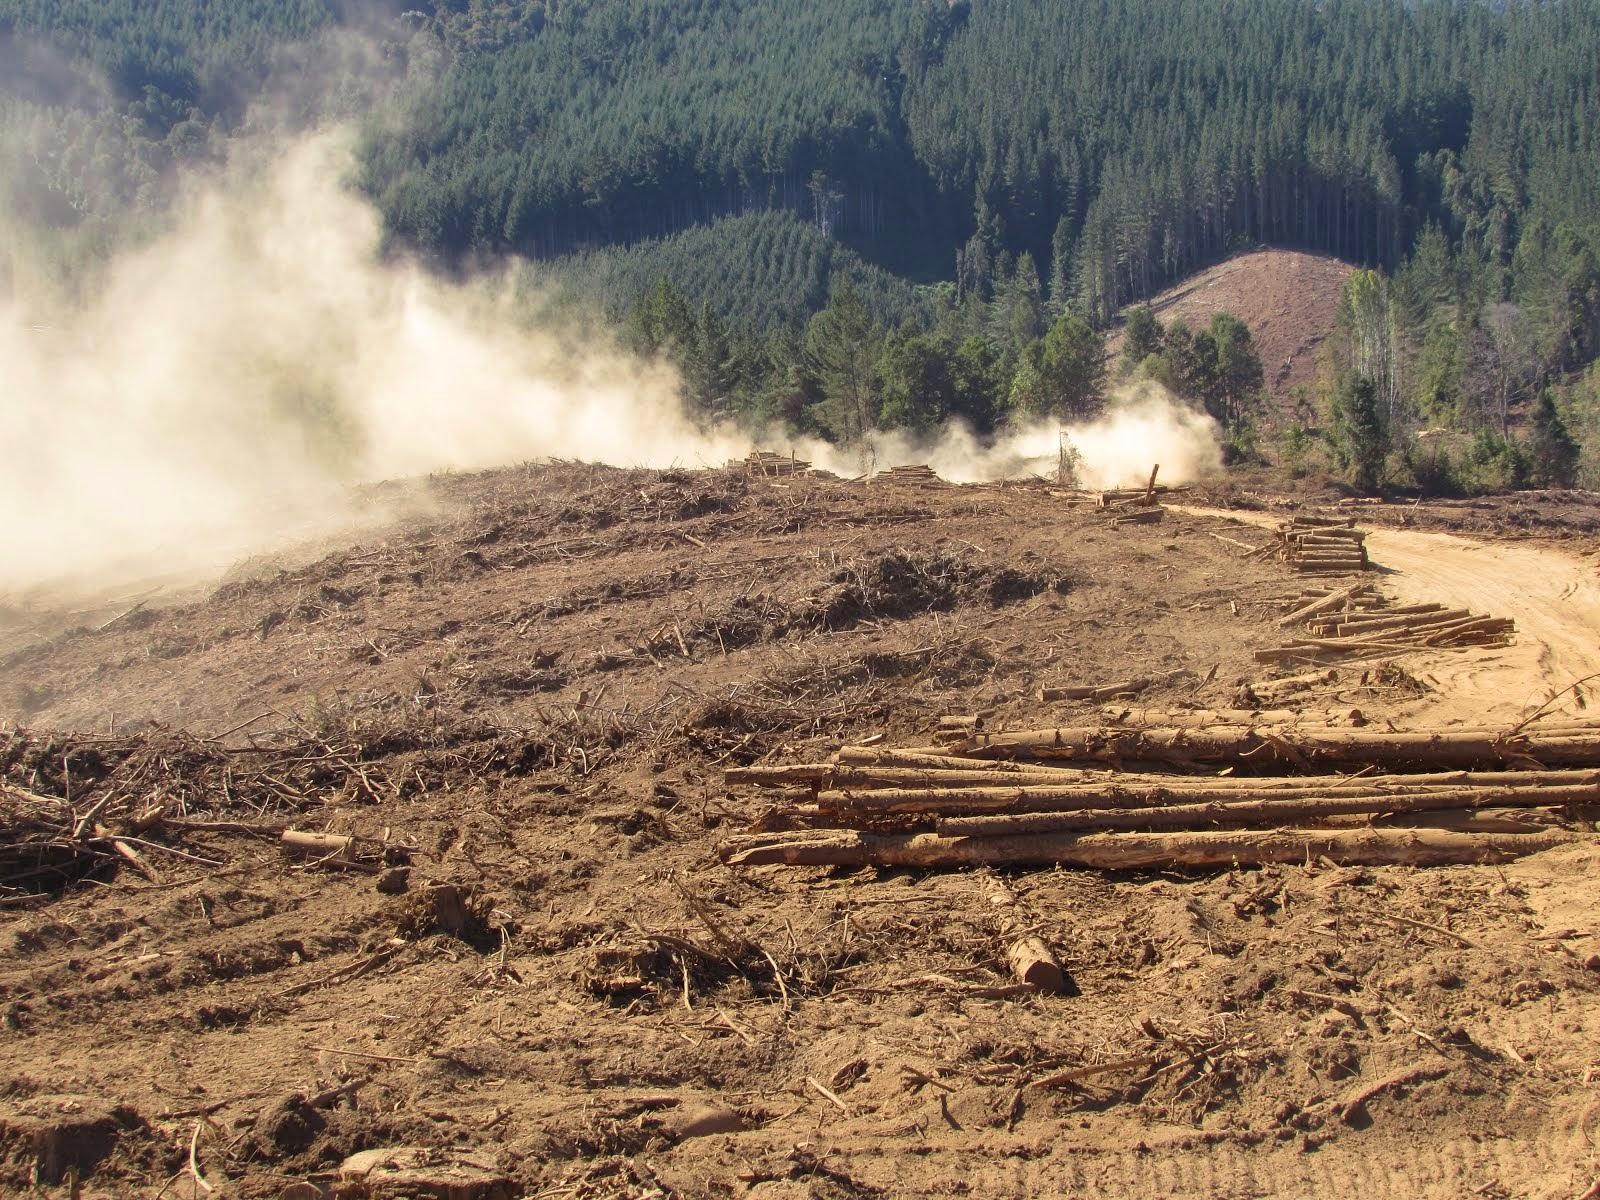 Fundo Forestal Arauco Valdivia, Territorio Ancestral de la Comunidad Mapuche de Lumaco, Lanco